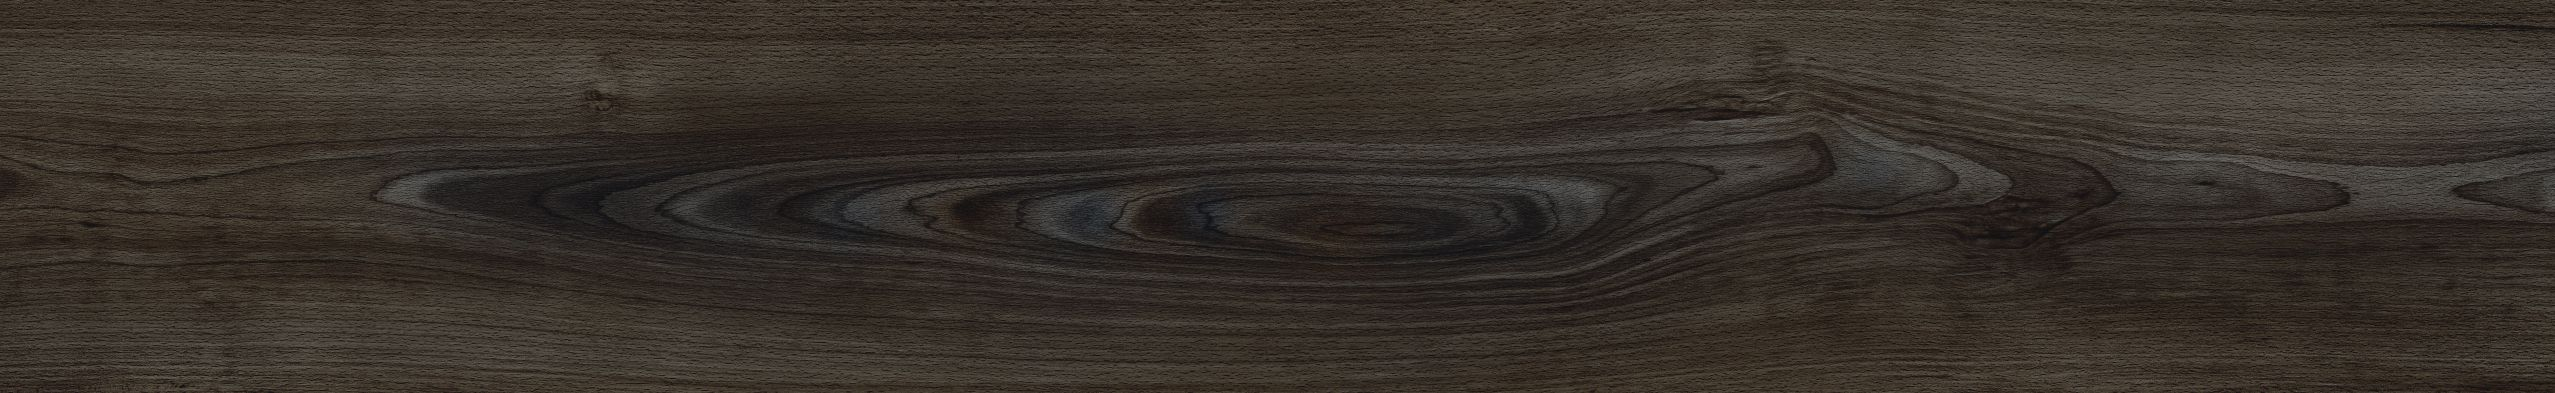 Panele winylowe LVT modulari ® WOOD DRYBACK 19,6 x 132 cm 28881